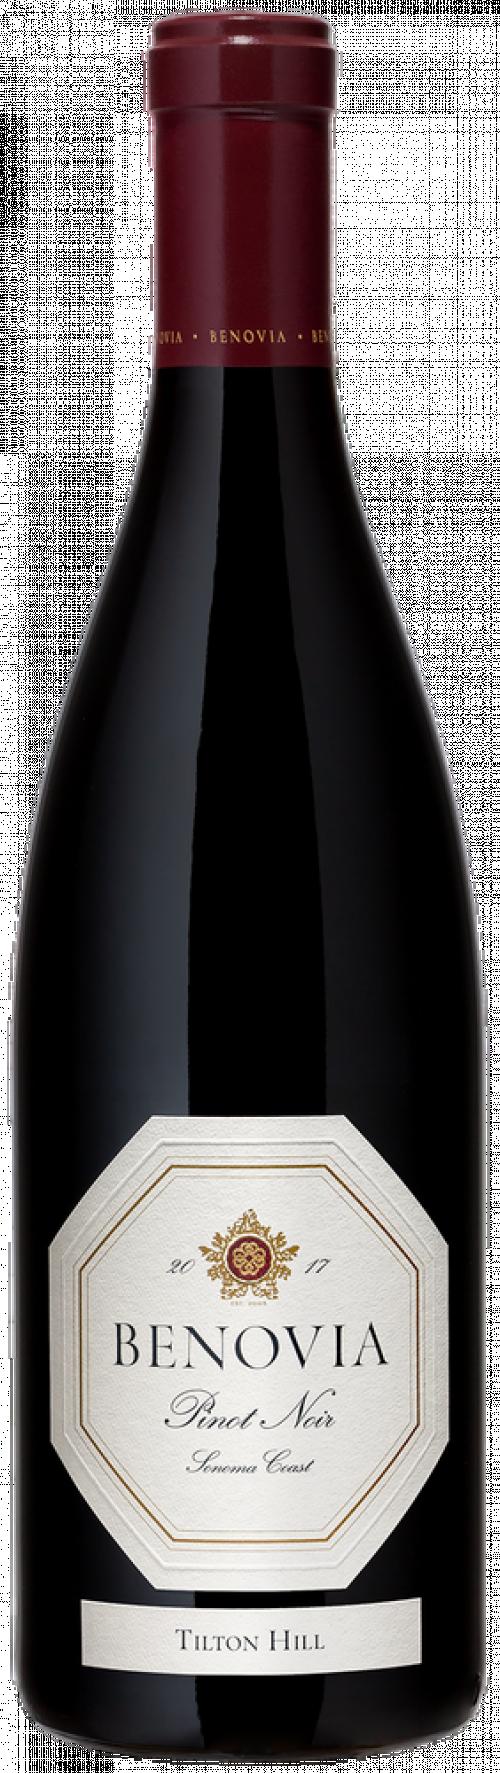 2017 Benovia Tilton Hill Pinot Noir 750ml